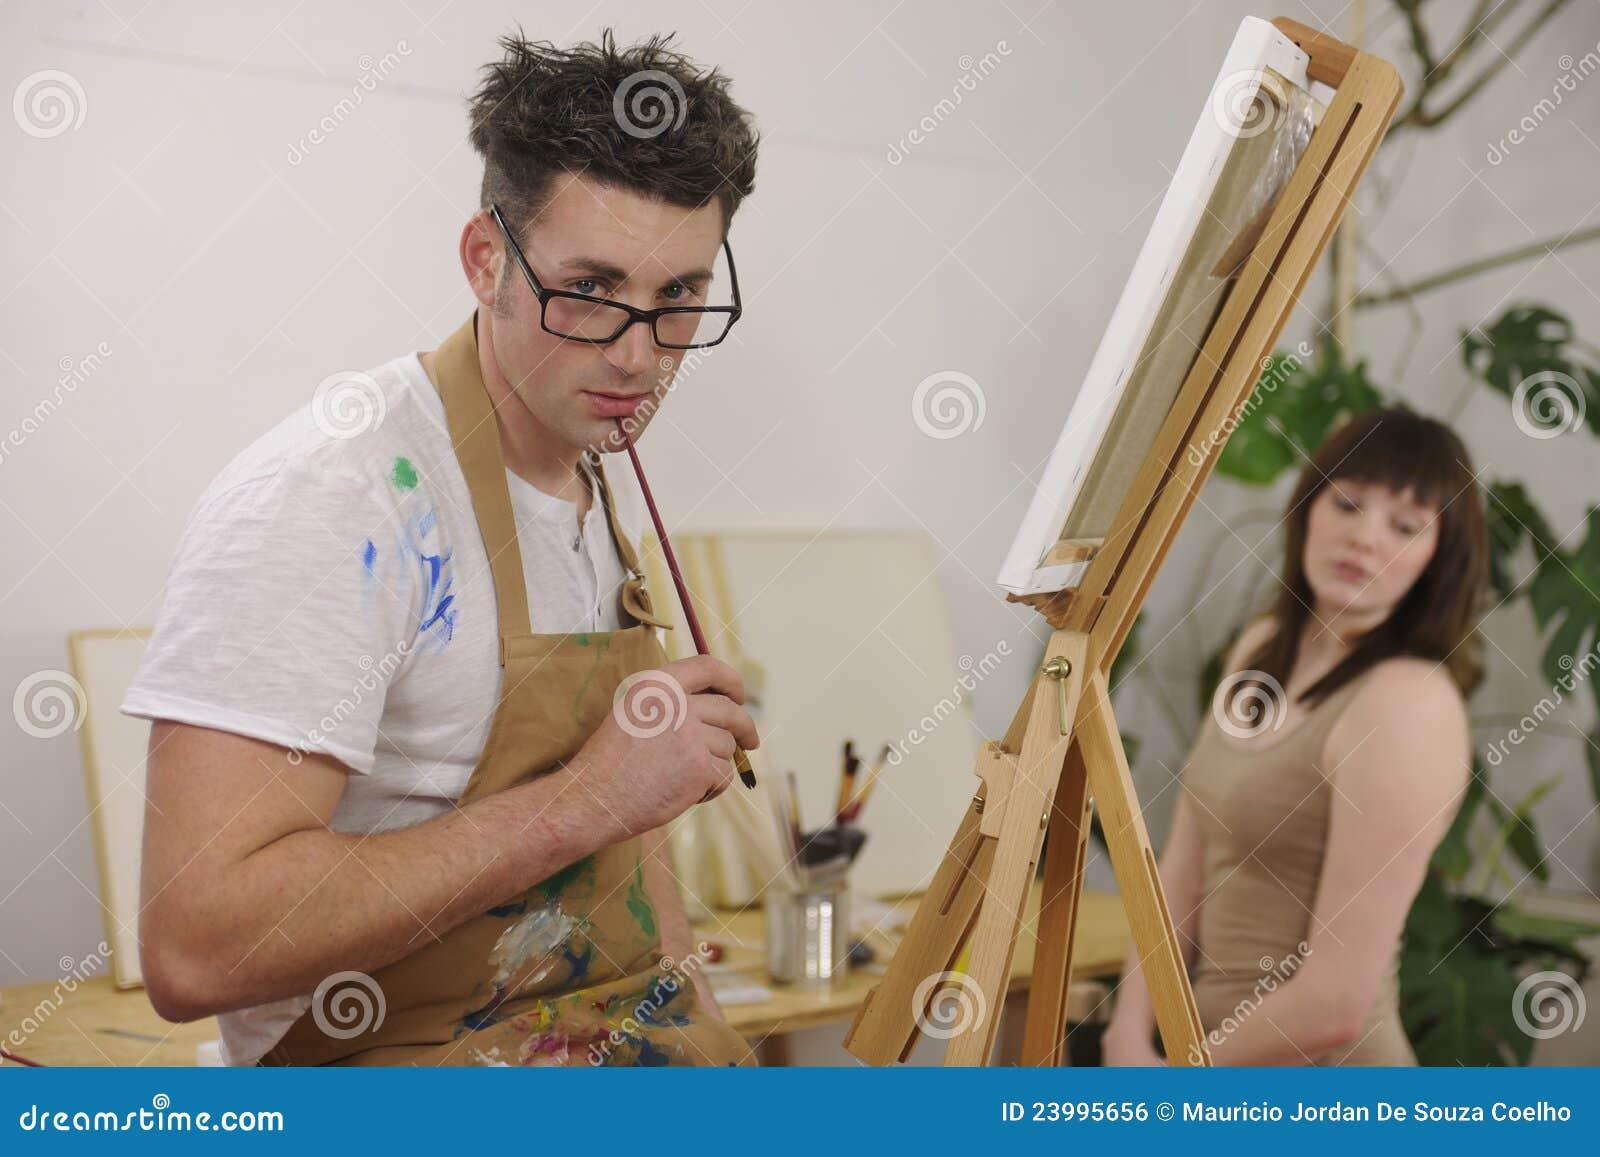 Dibujo y pintura cfnm - 4 9